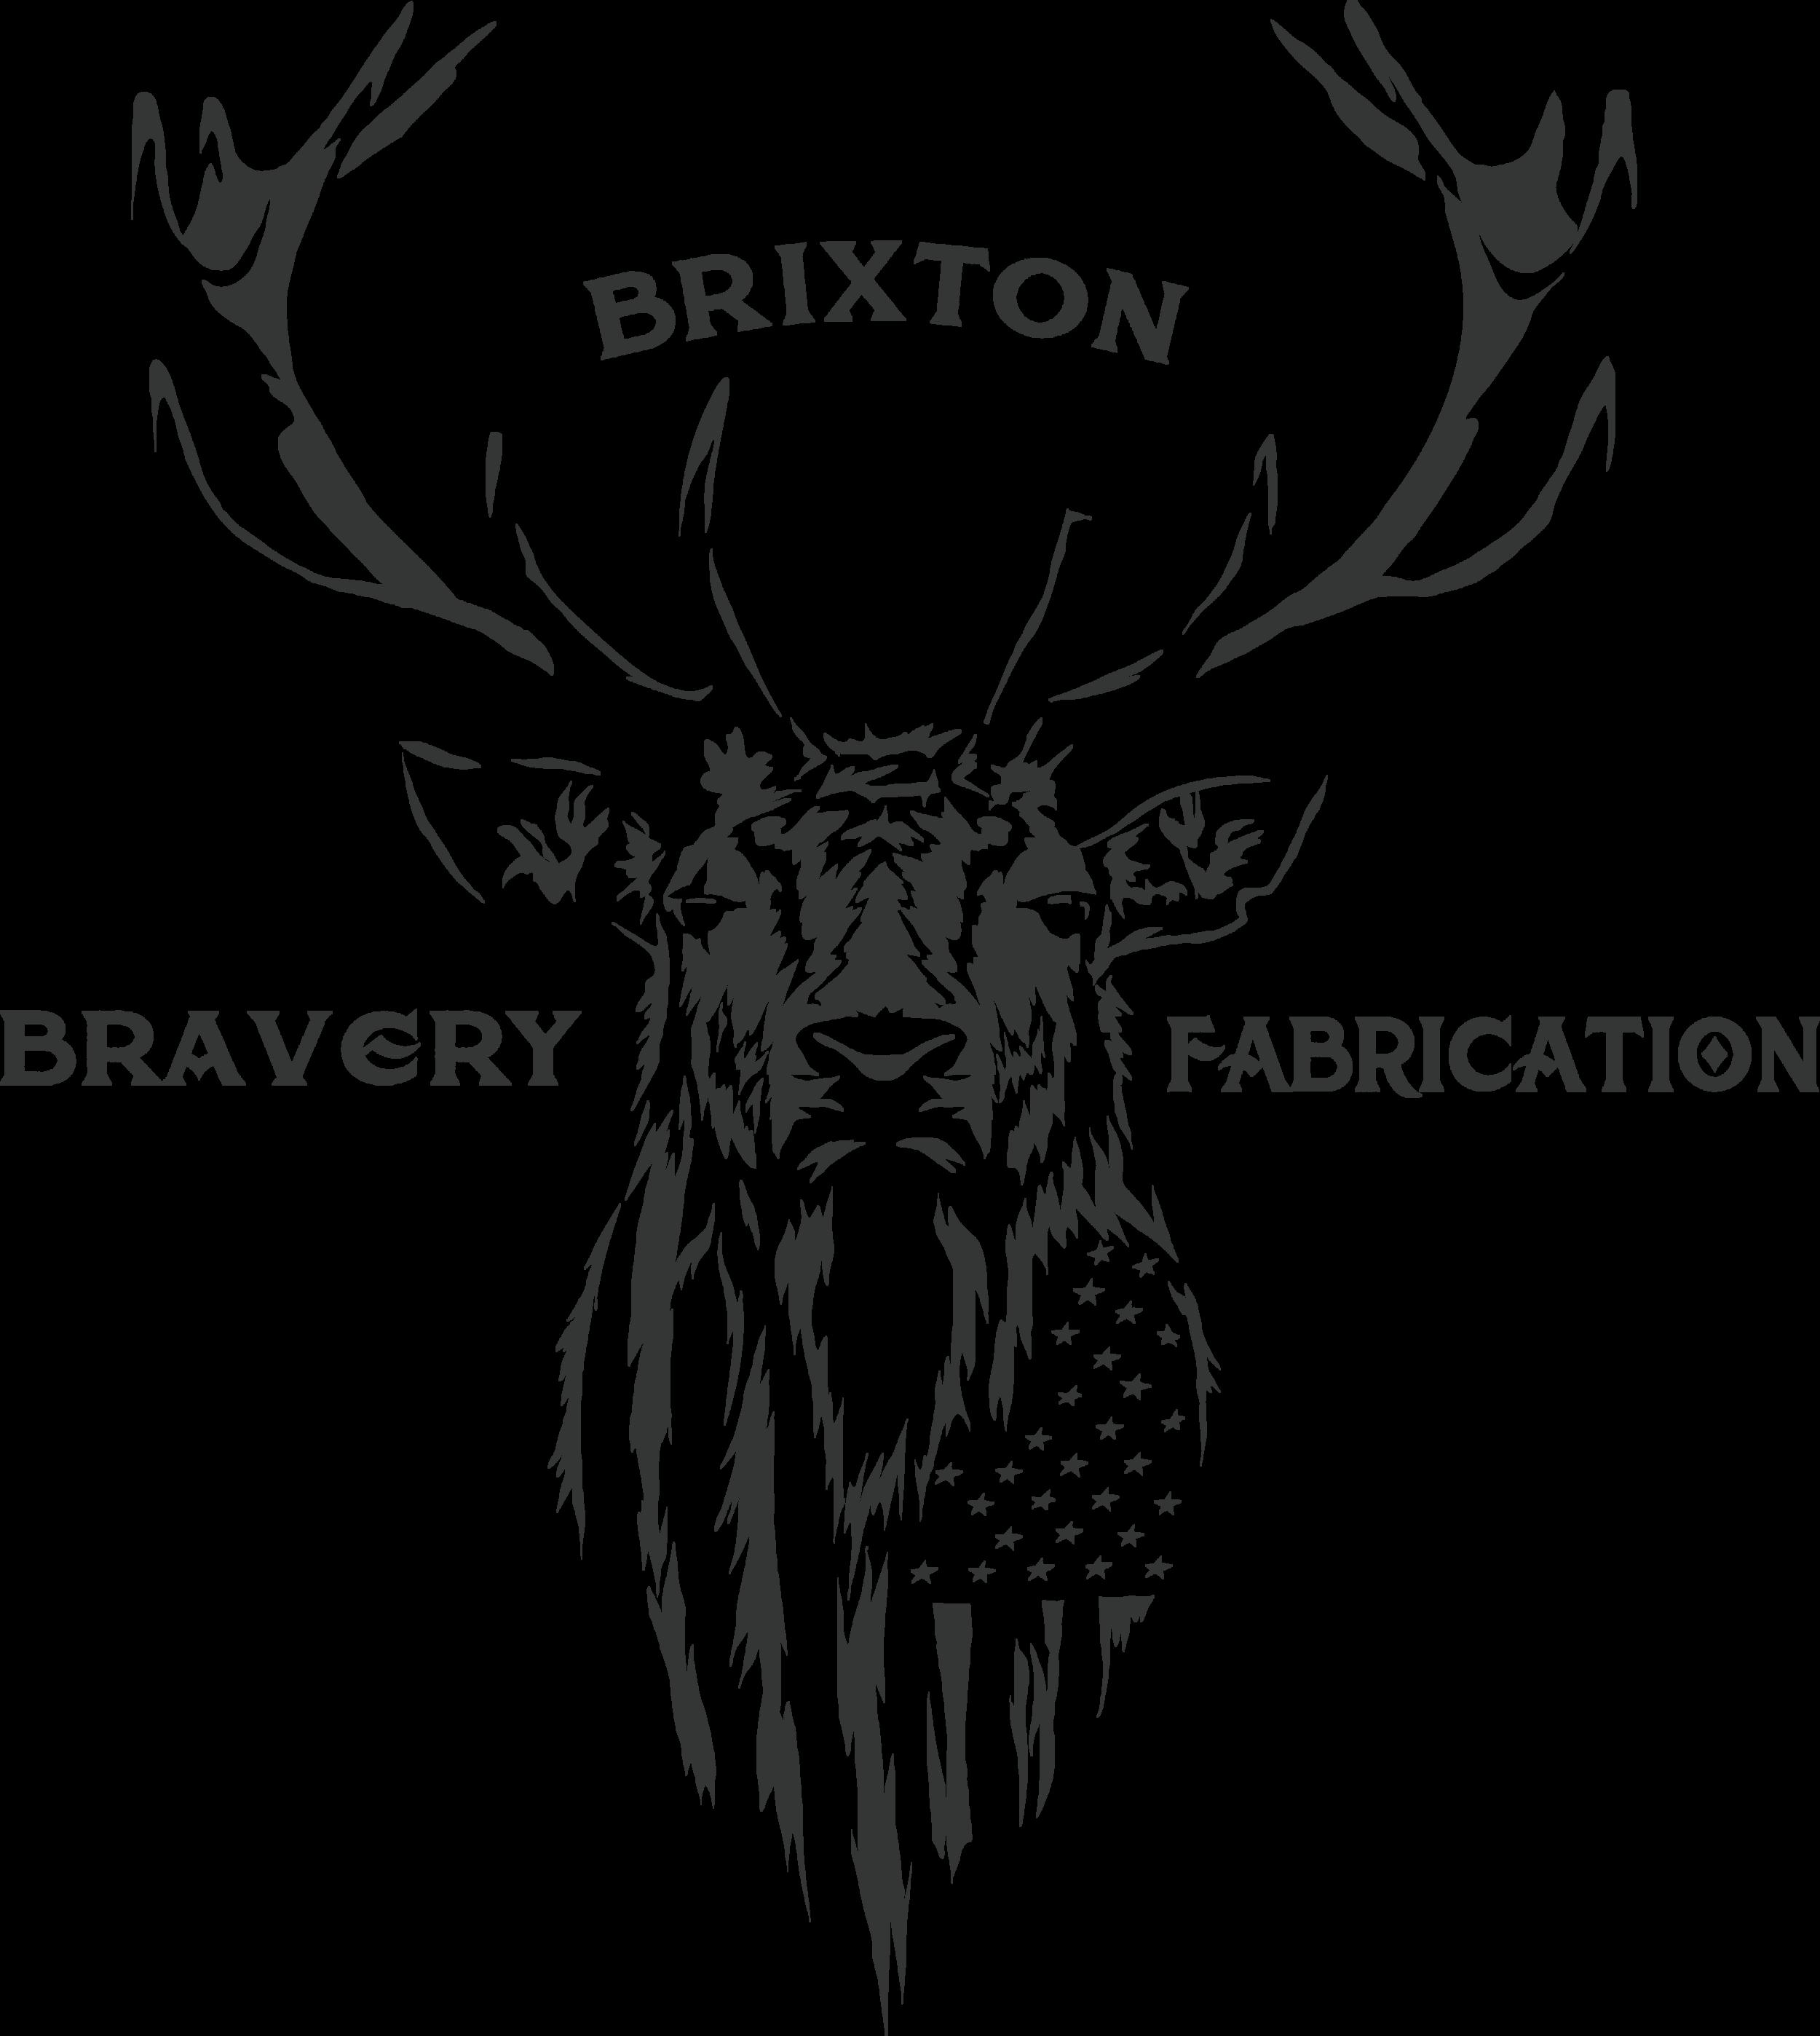 Brixton Logo Black Background.png